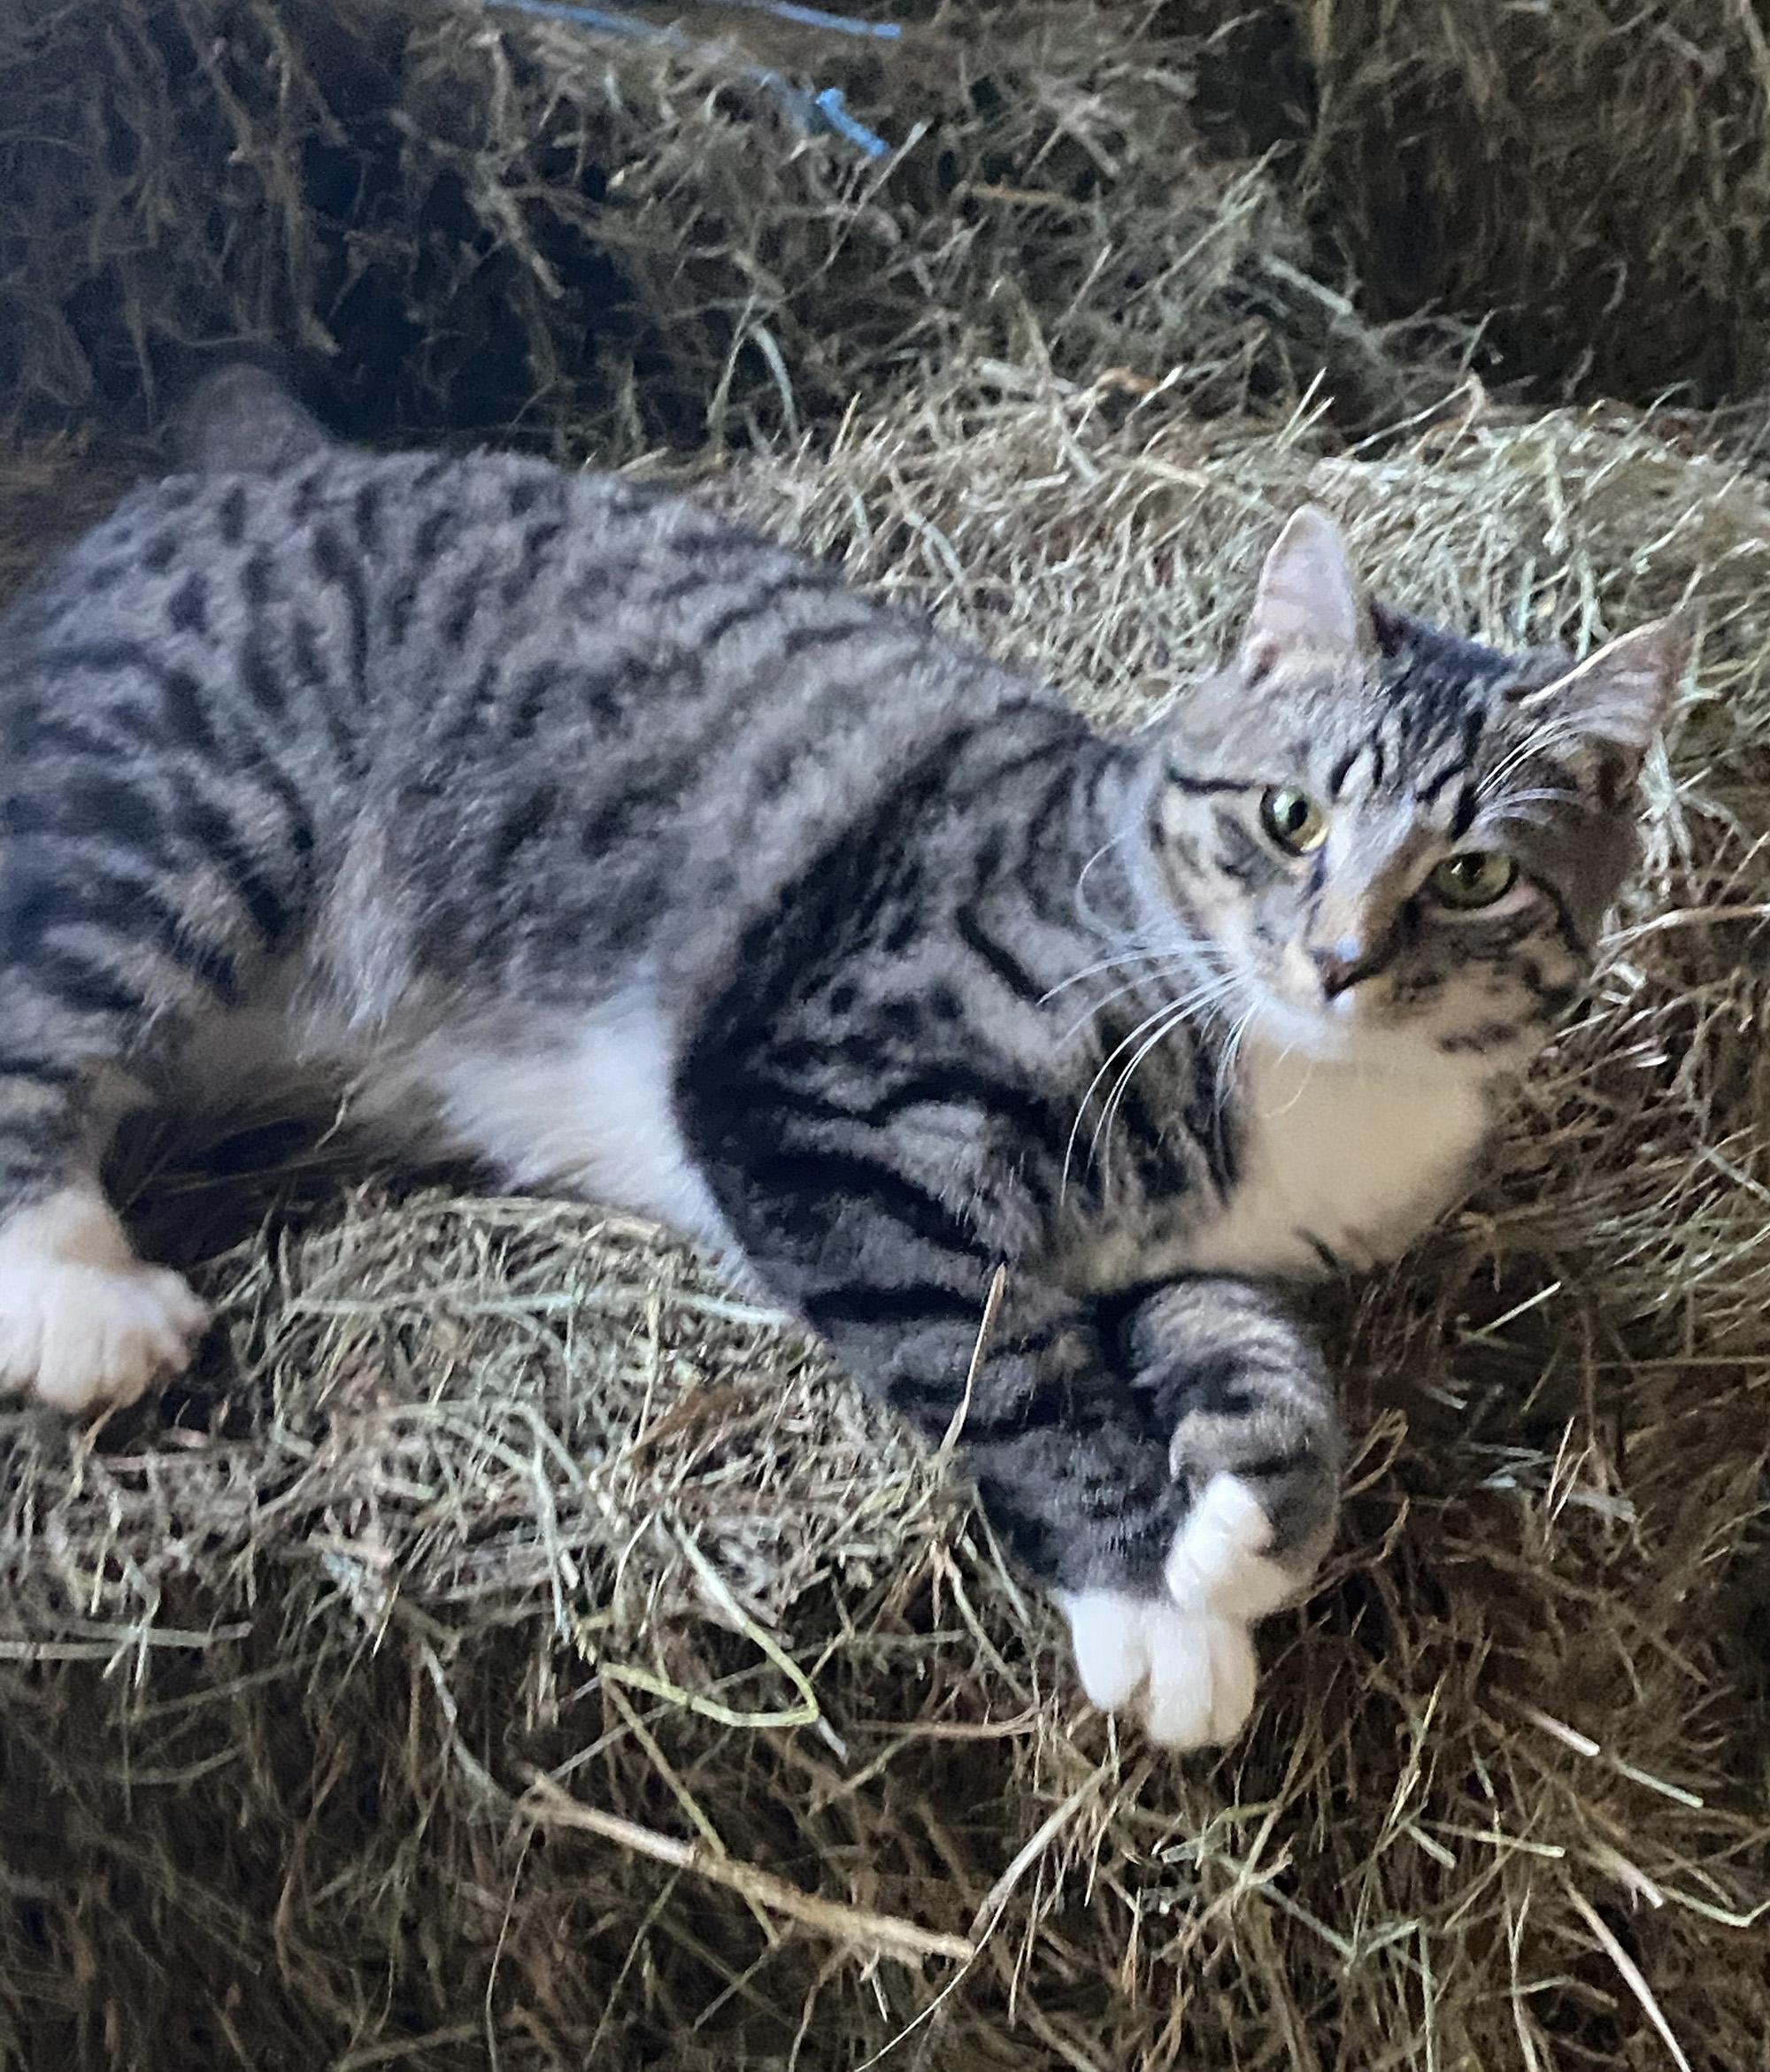 Poppy, Barn Cat in Training